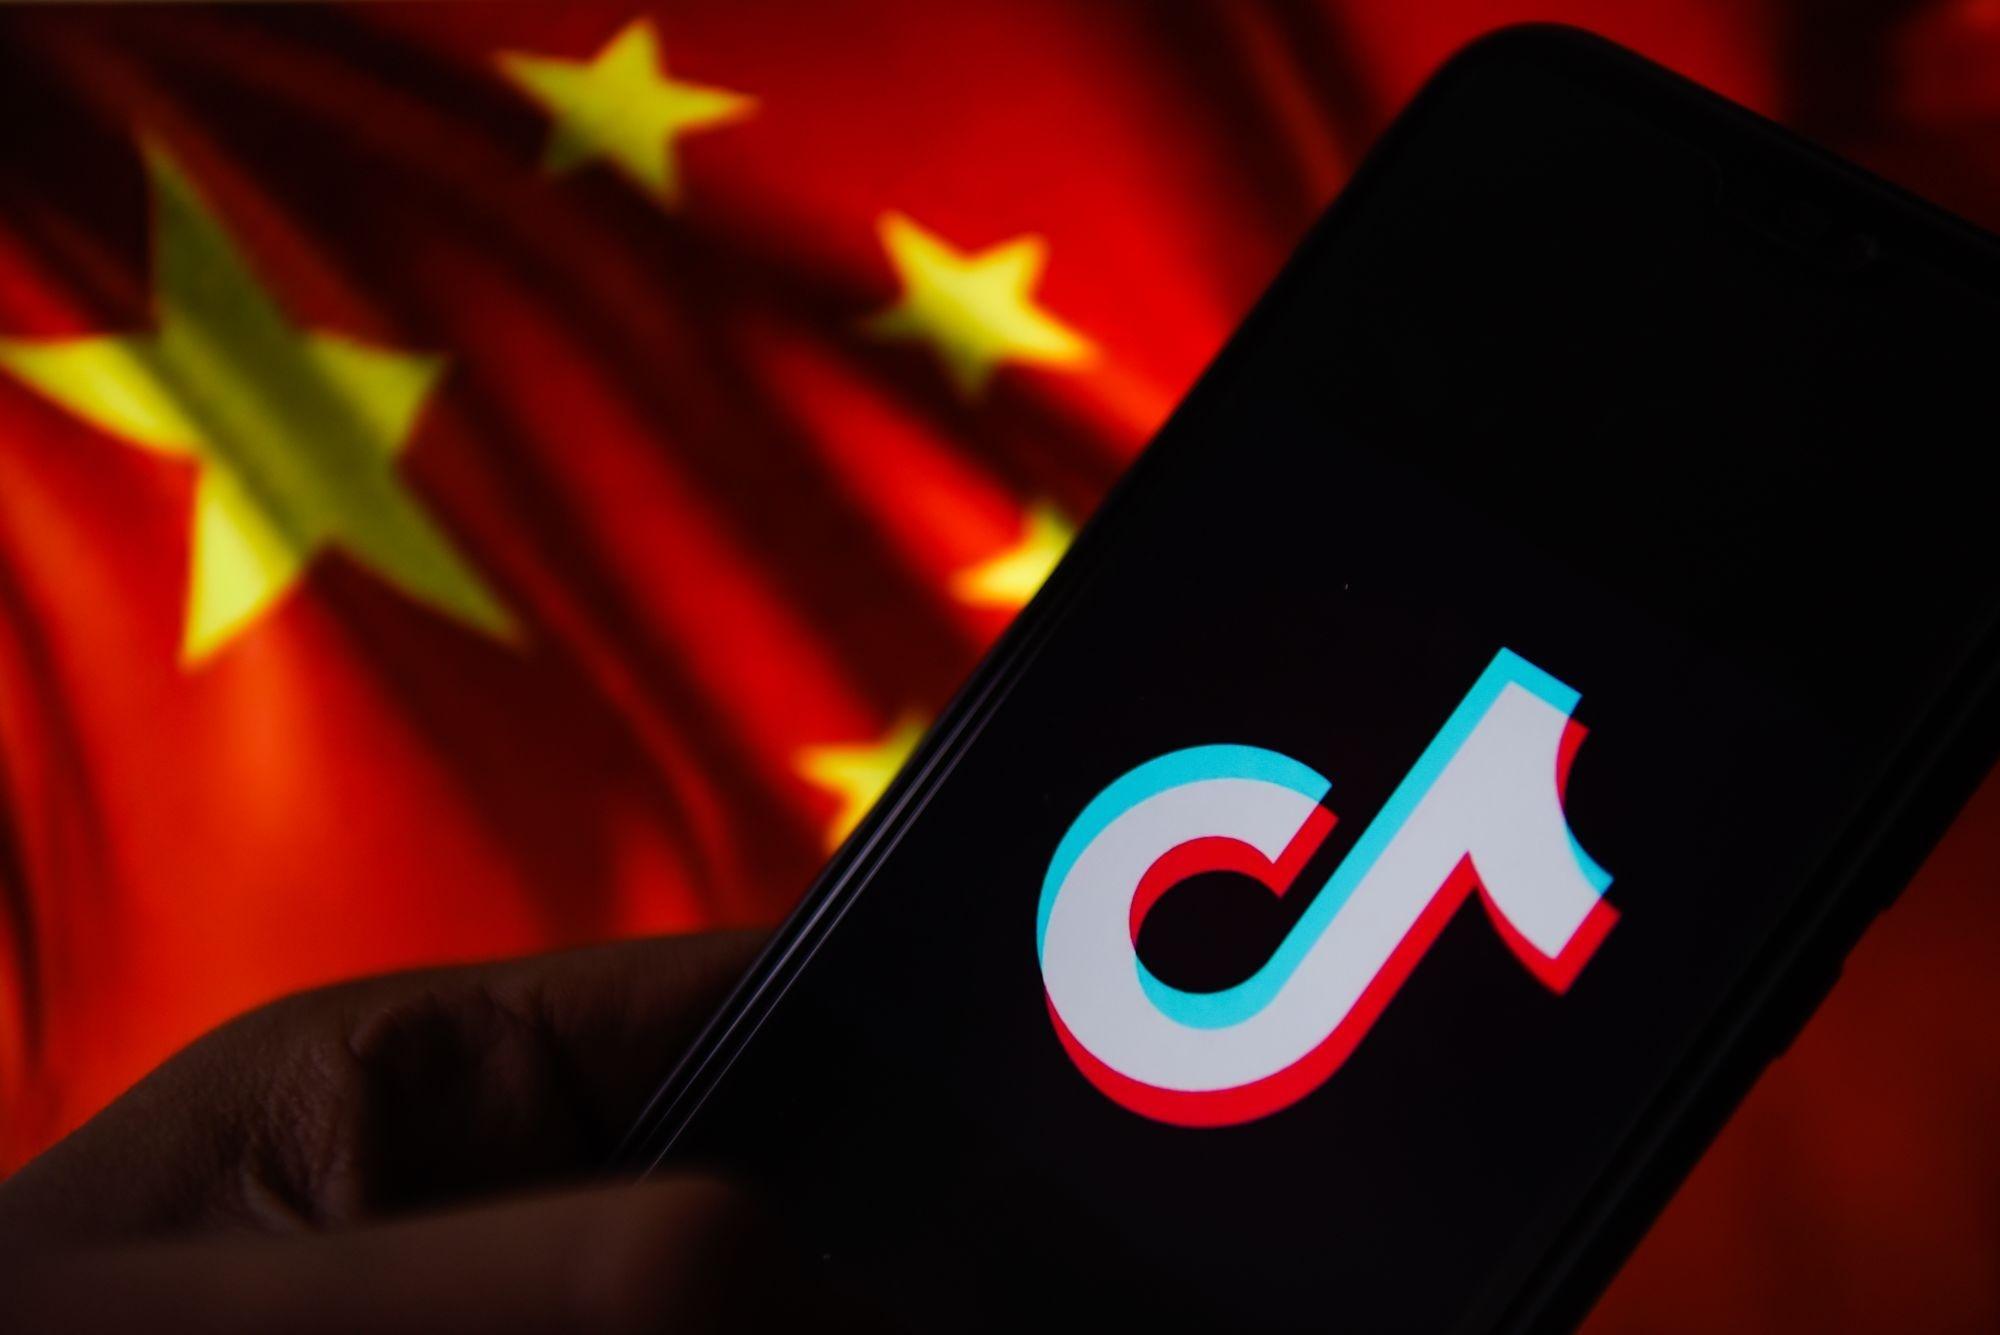 Global Times: Китай не одобрит сделку по приобретению TikTok